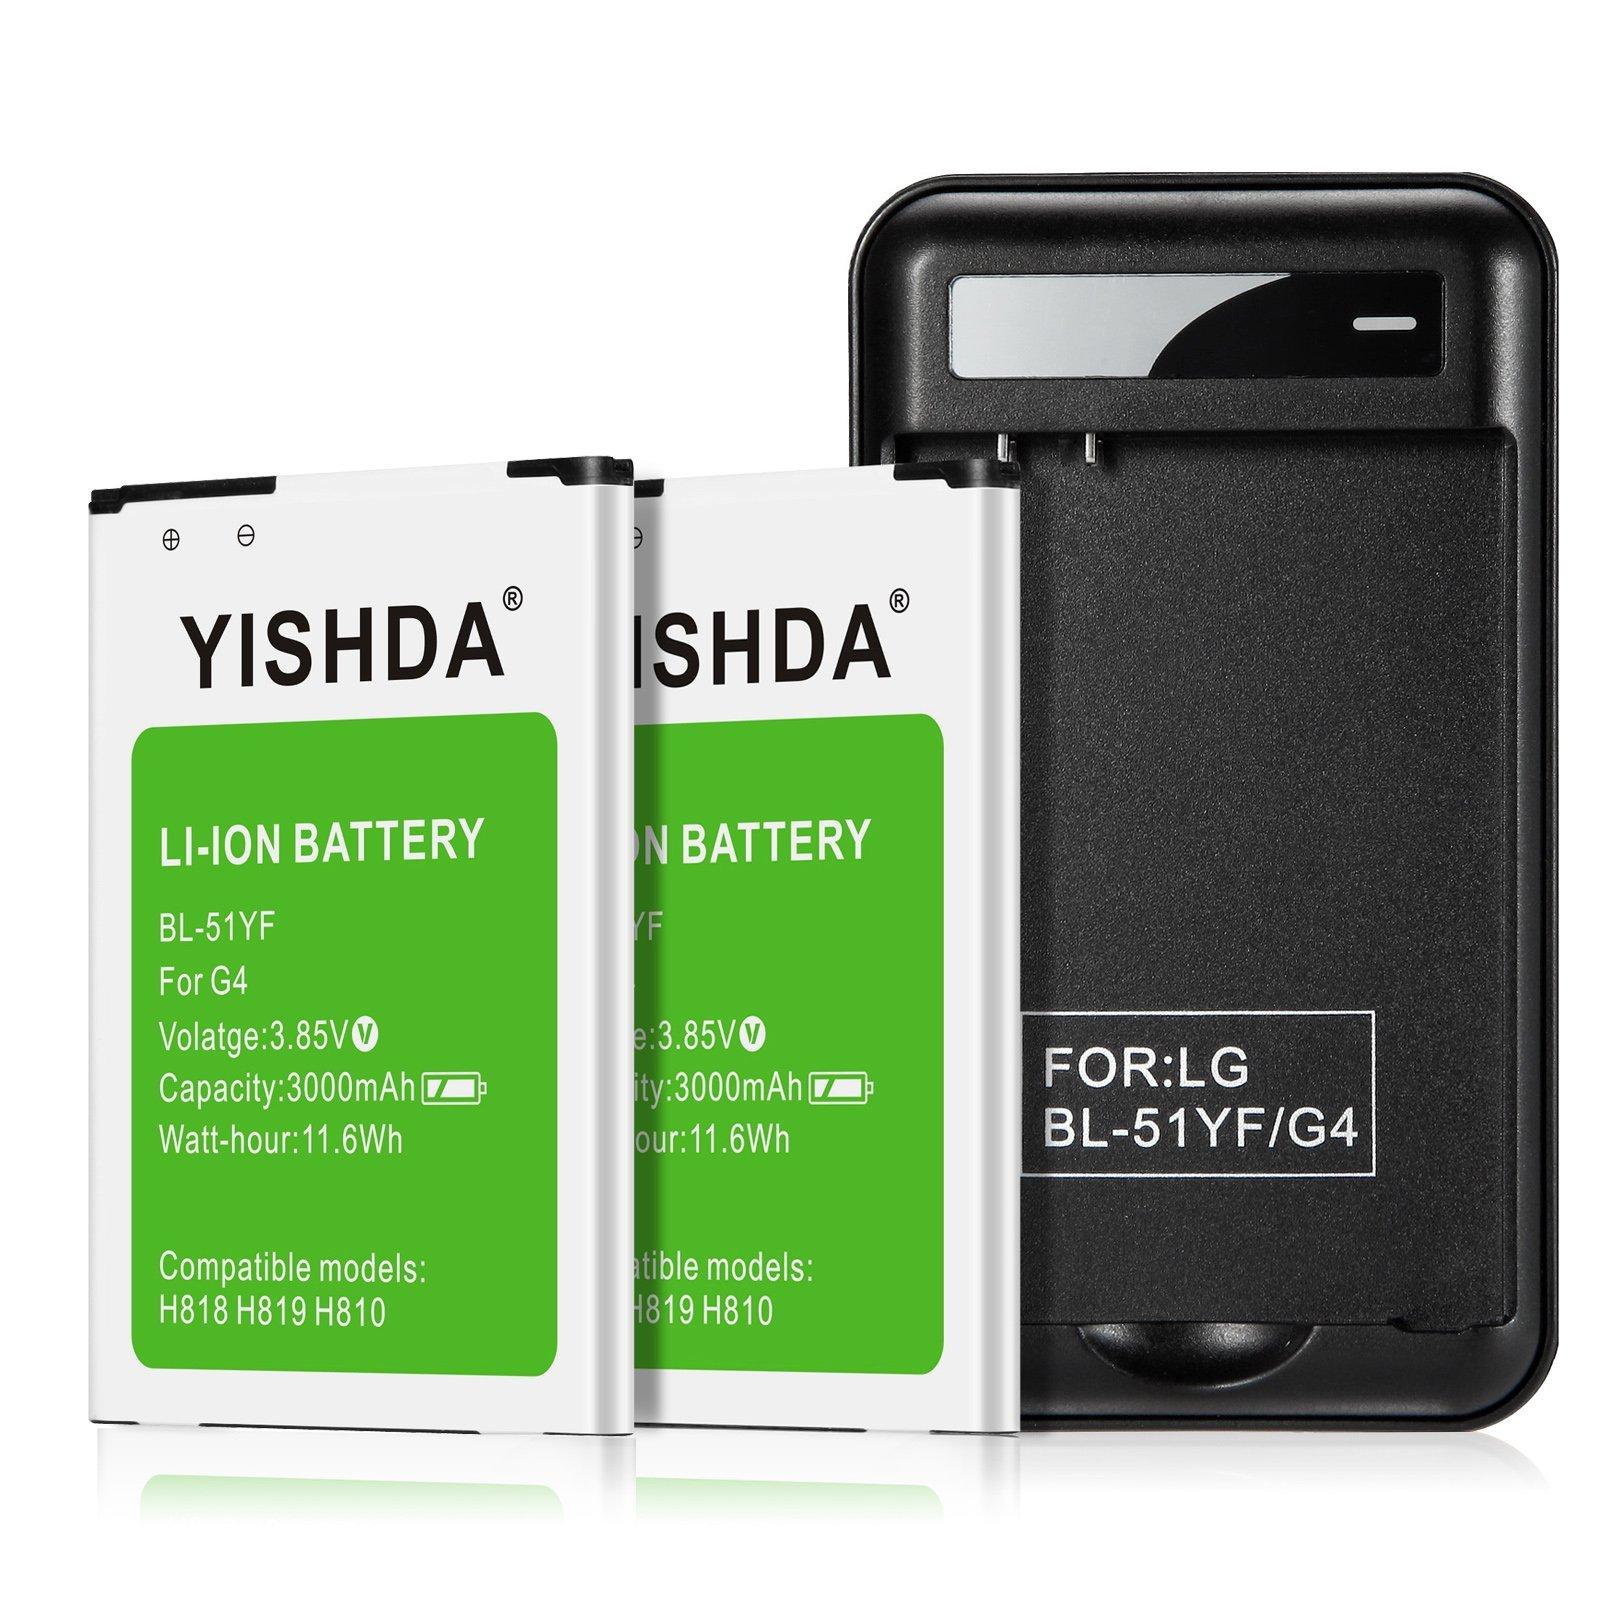 YISHDA LG G4 Batteries, 2 x 3000mAh Li-ion BL-51YF Battery for LG G4 H815 H810 H811 LS991 US986 US991 with LG G4 USB Wall Travel Spare Battery Charger | LG G4 Replacement Battery Kit